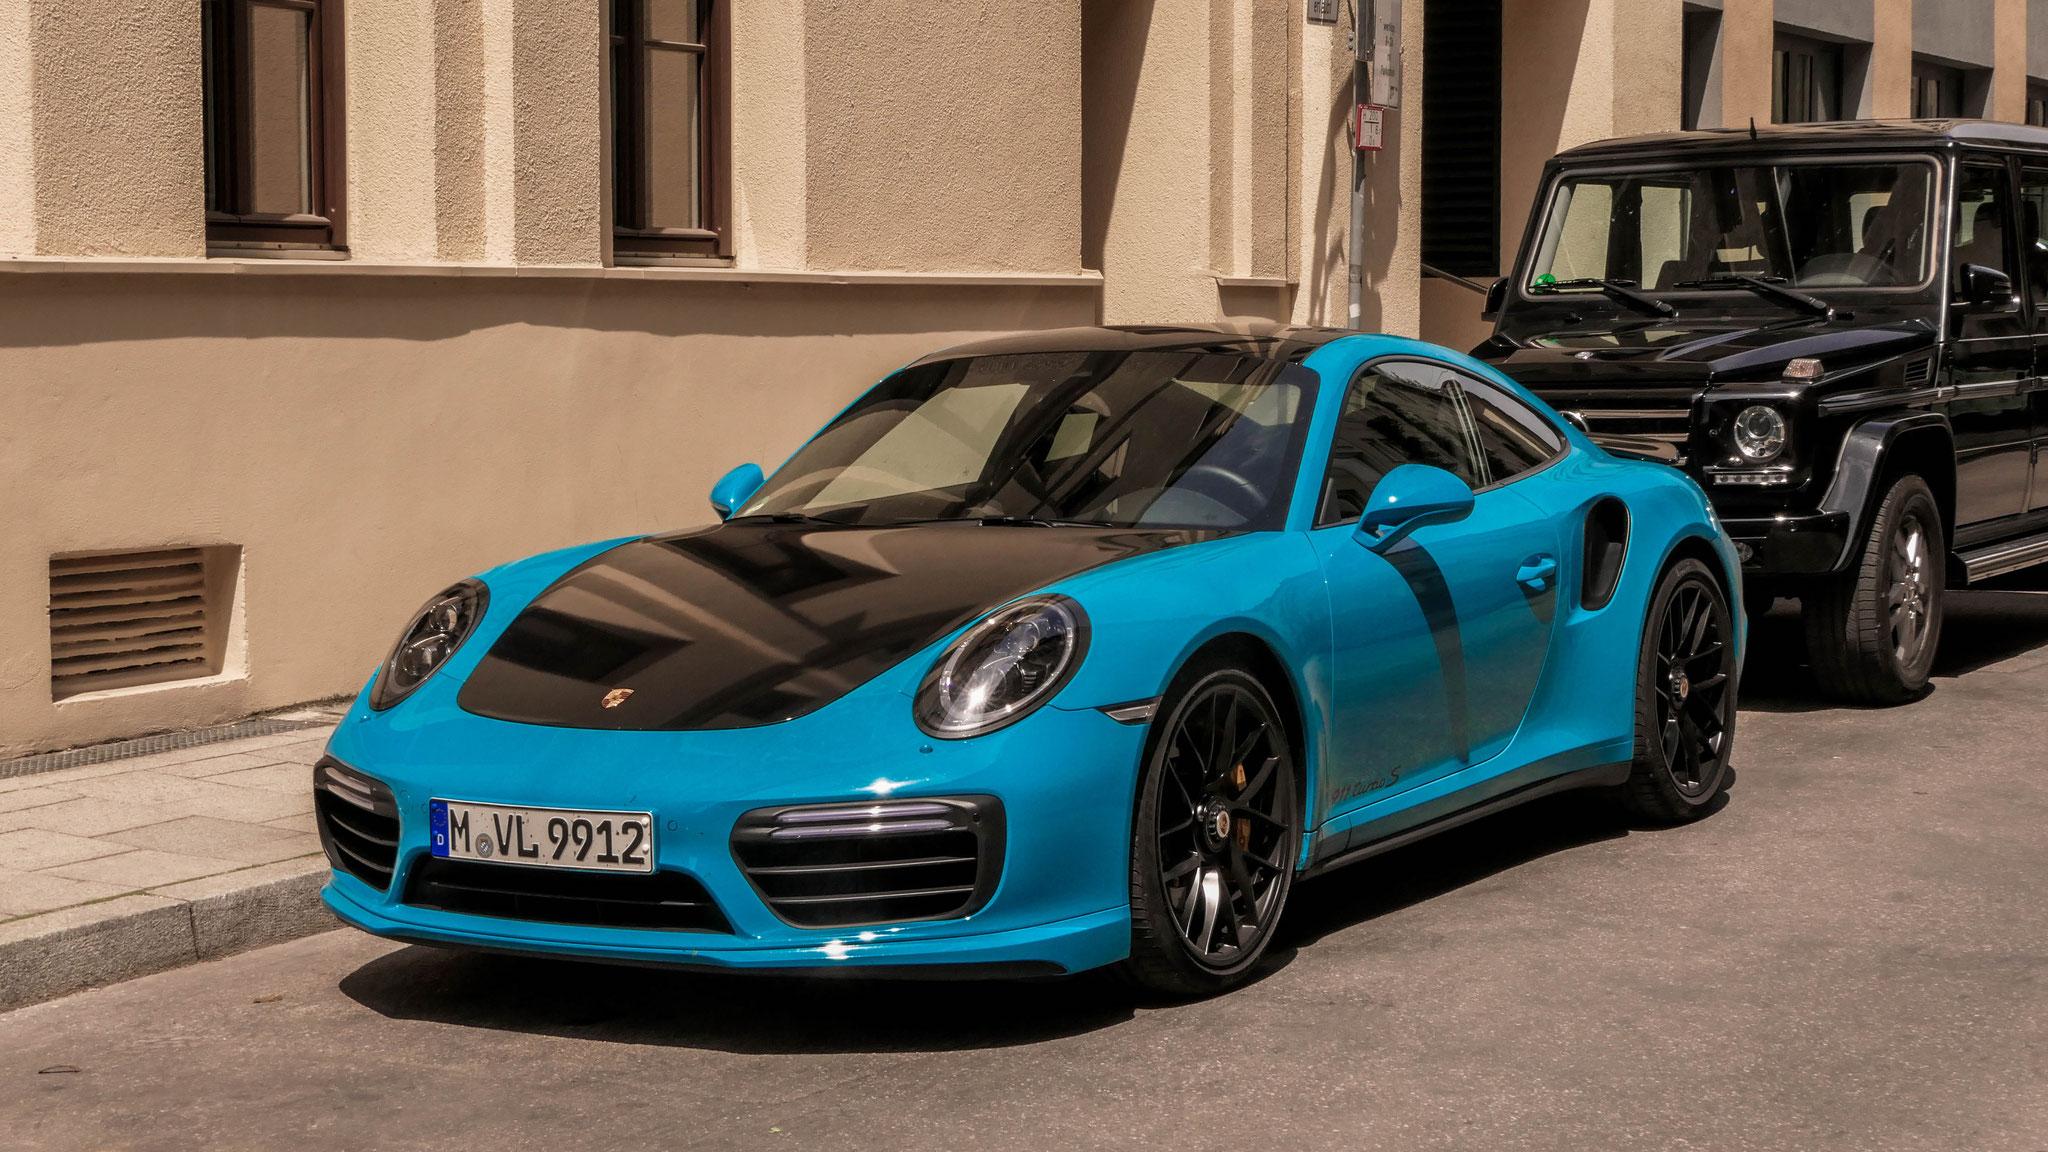 Porsche 911 Turbo - M-VL-9912